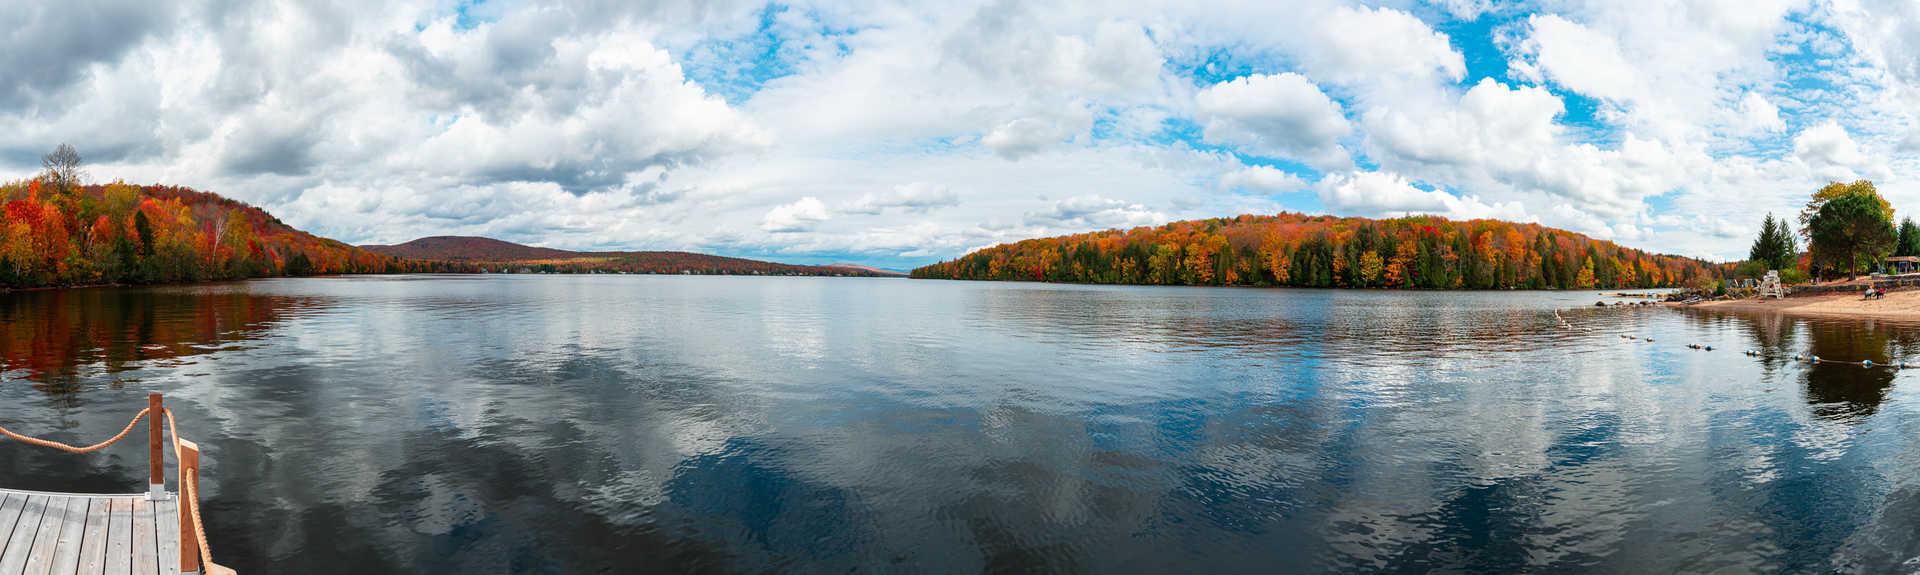 Lac St-Joseph - Duschesnay